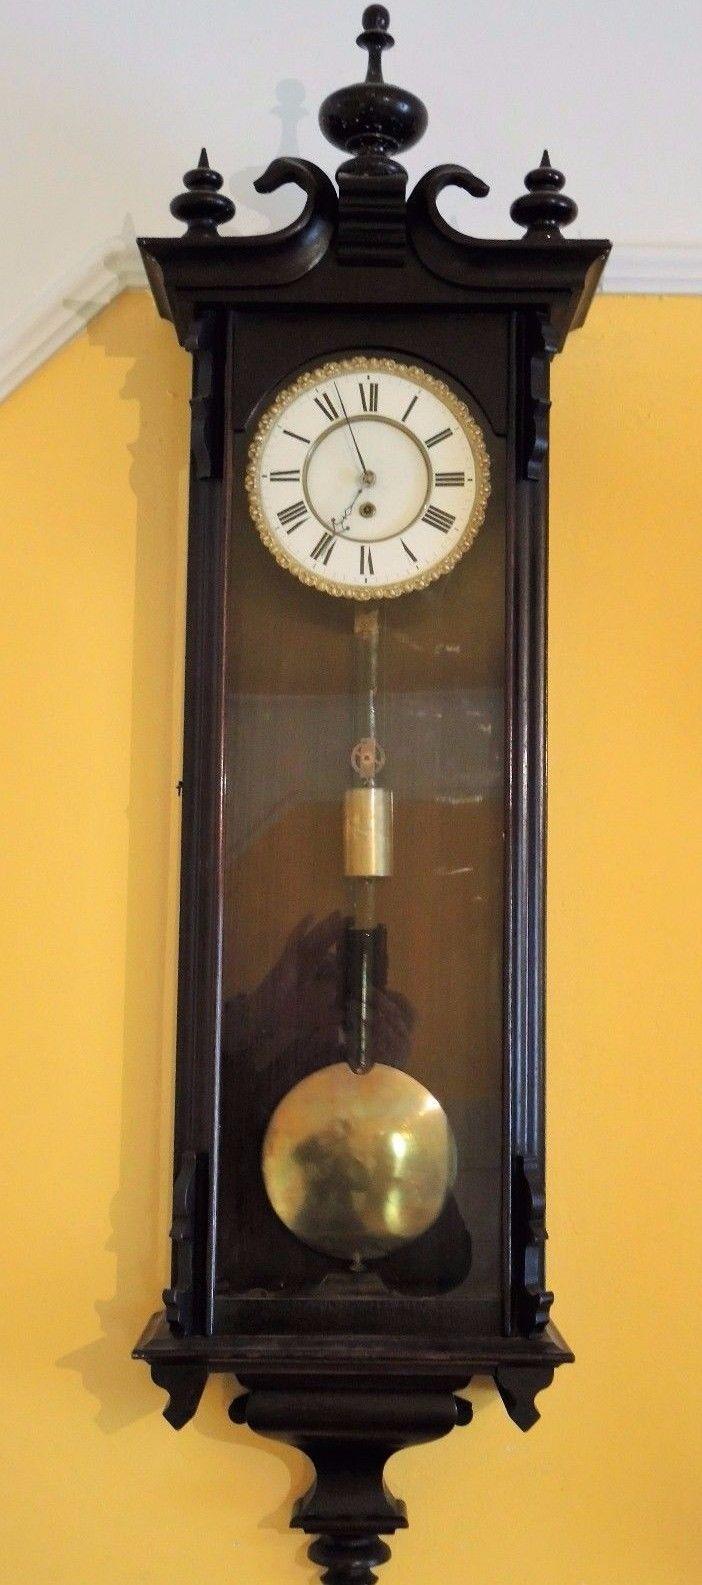 Antique Biedermeier Vienna Regulator Wall Clock  eBay